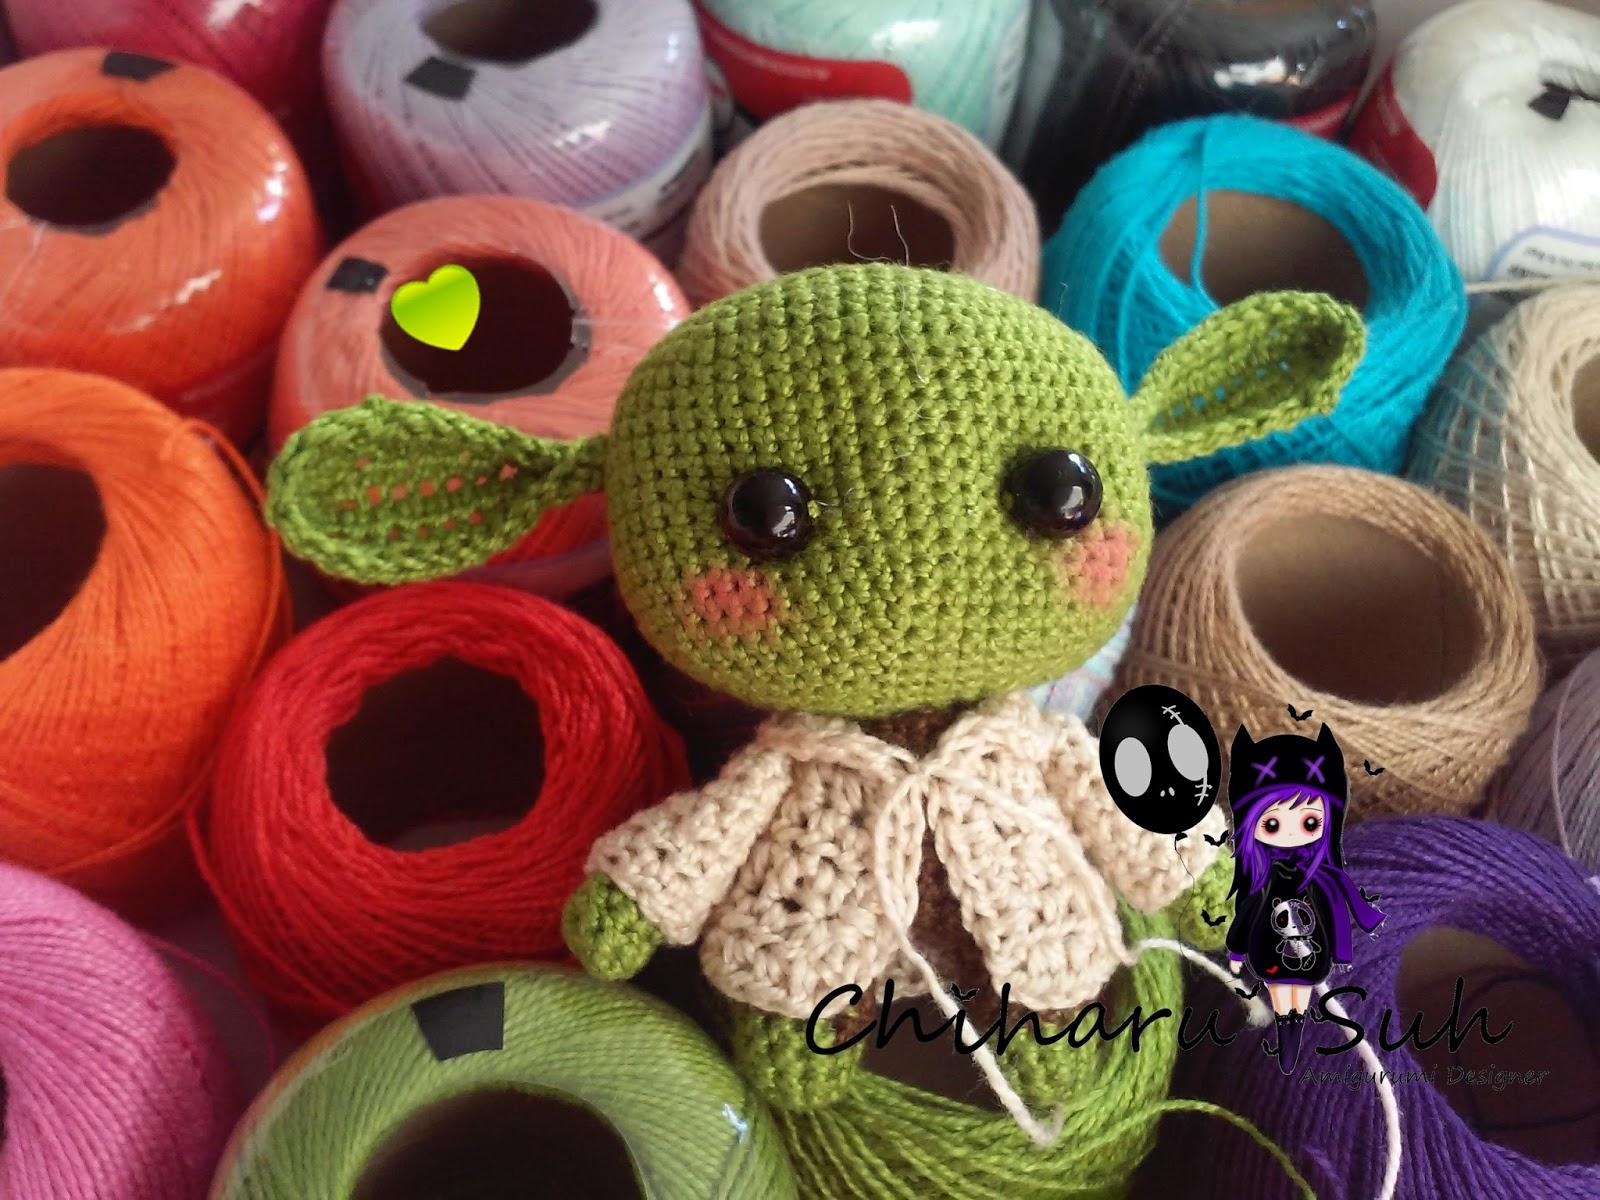 Bonecos Chewbacca E Mestre Yoda Em Crochê Amigurumi - R$ 189,00 em ...   1200x1600